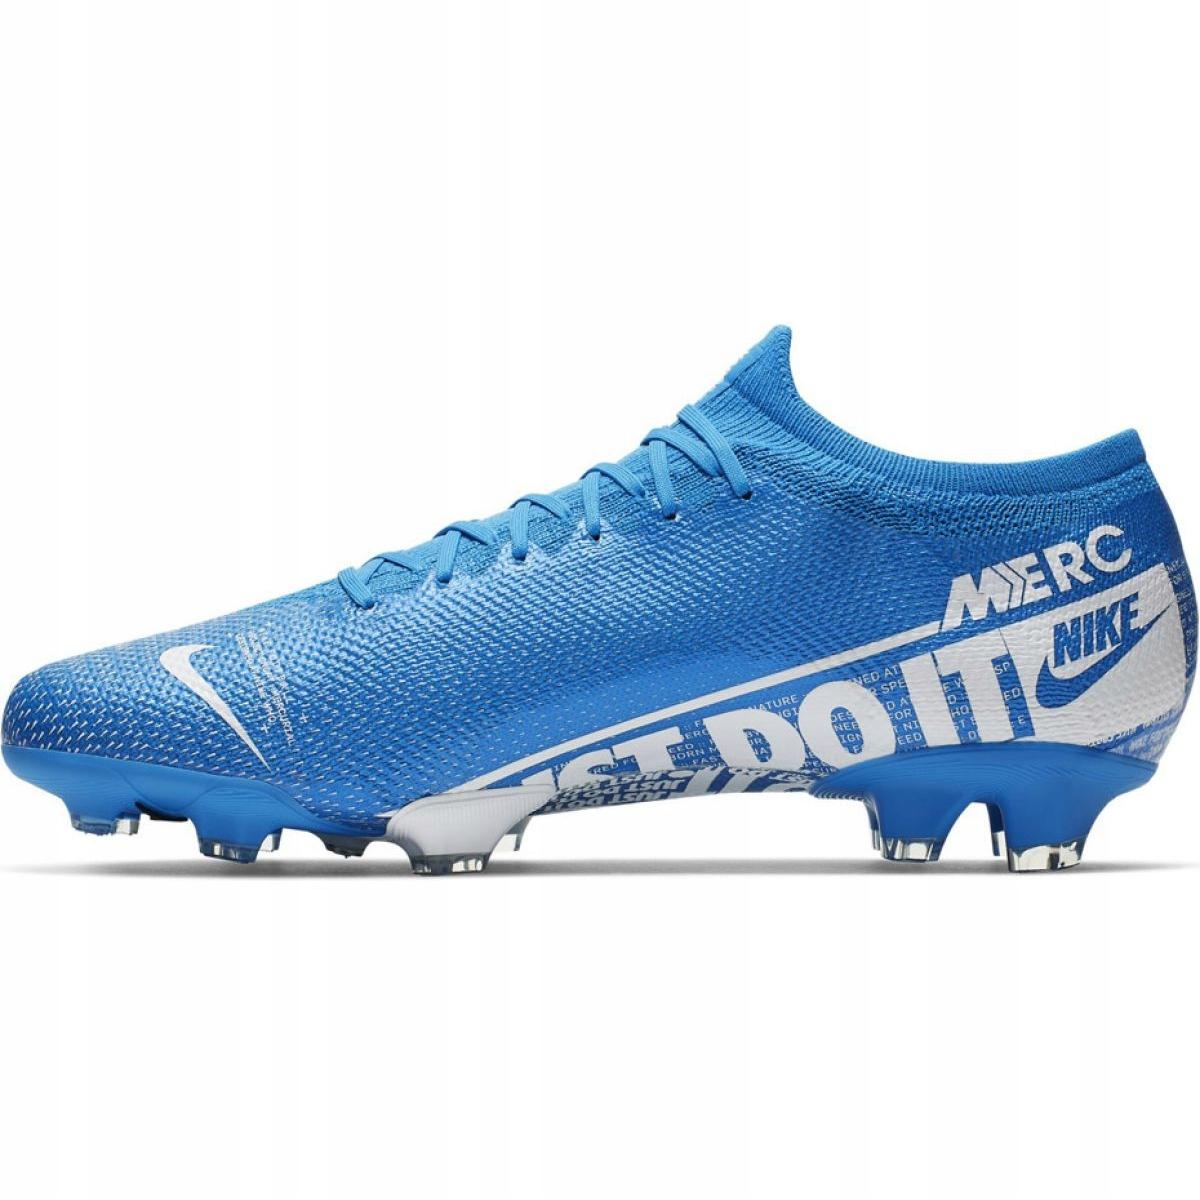 Nike mercurial vapor 13 academy fg focicipő AT5269 414 Szi Zo